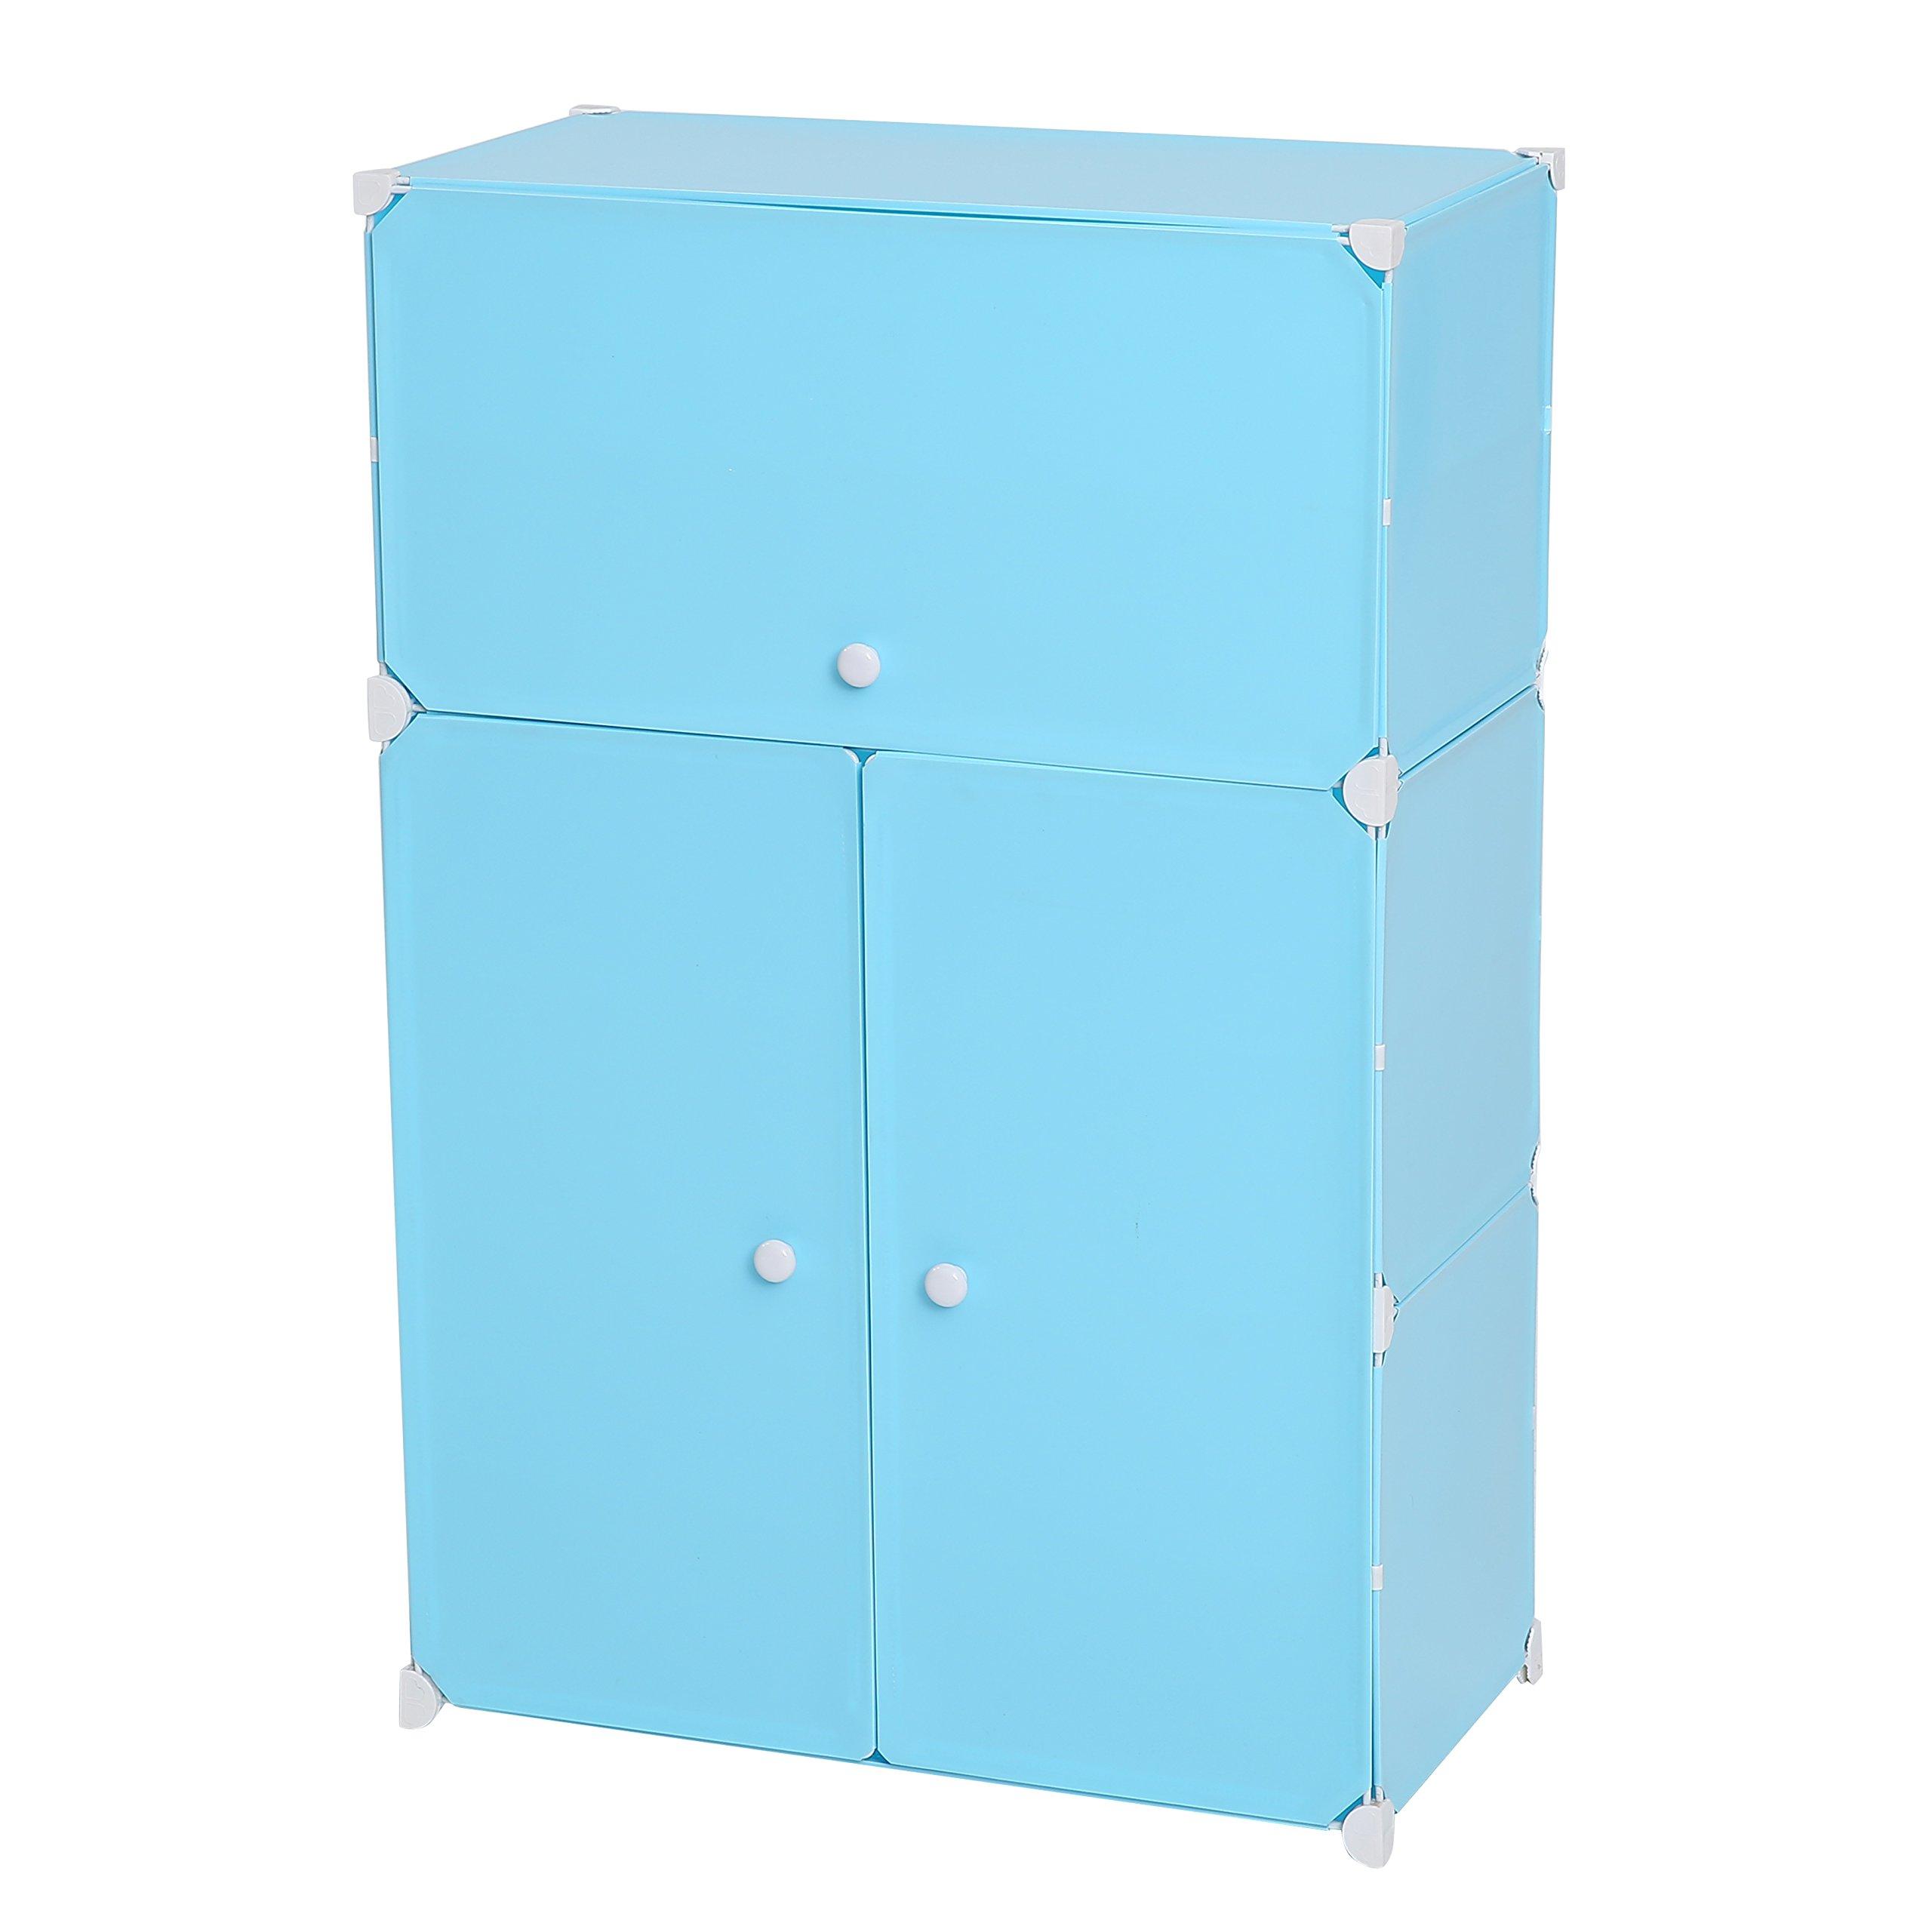 C&AHOME DIY Plastic 6 Cube Shoe Rack, Organizer, Bookcase, Shoe Cabinets Organizer Storage Plastic Drawers Blue with Doors